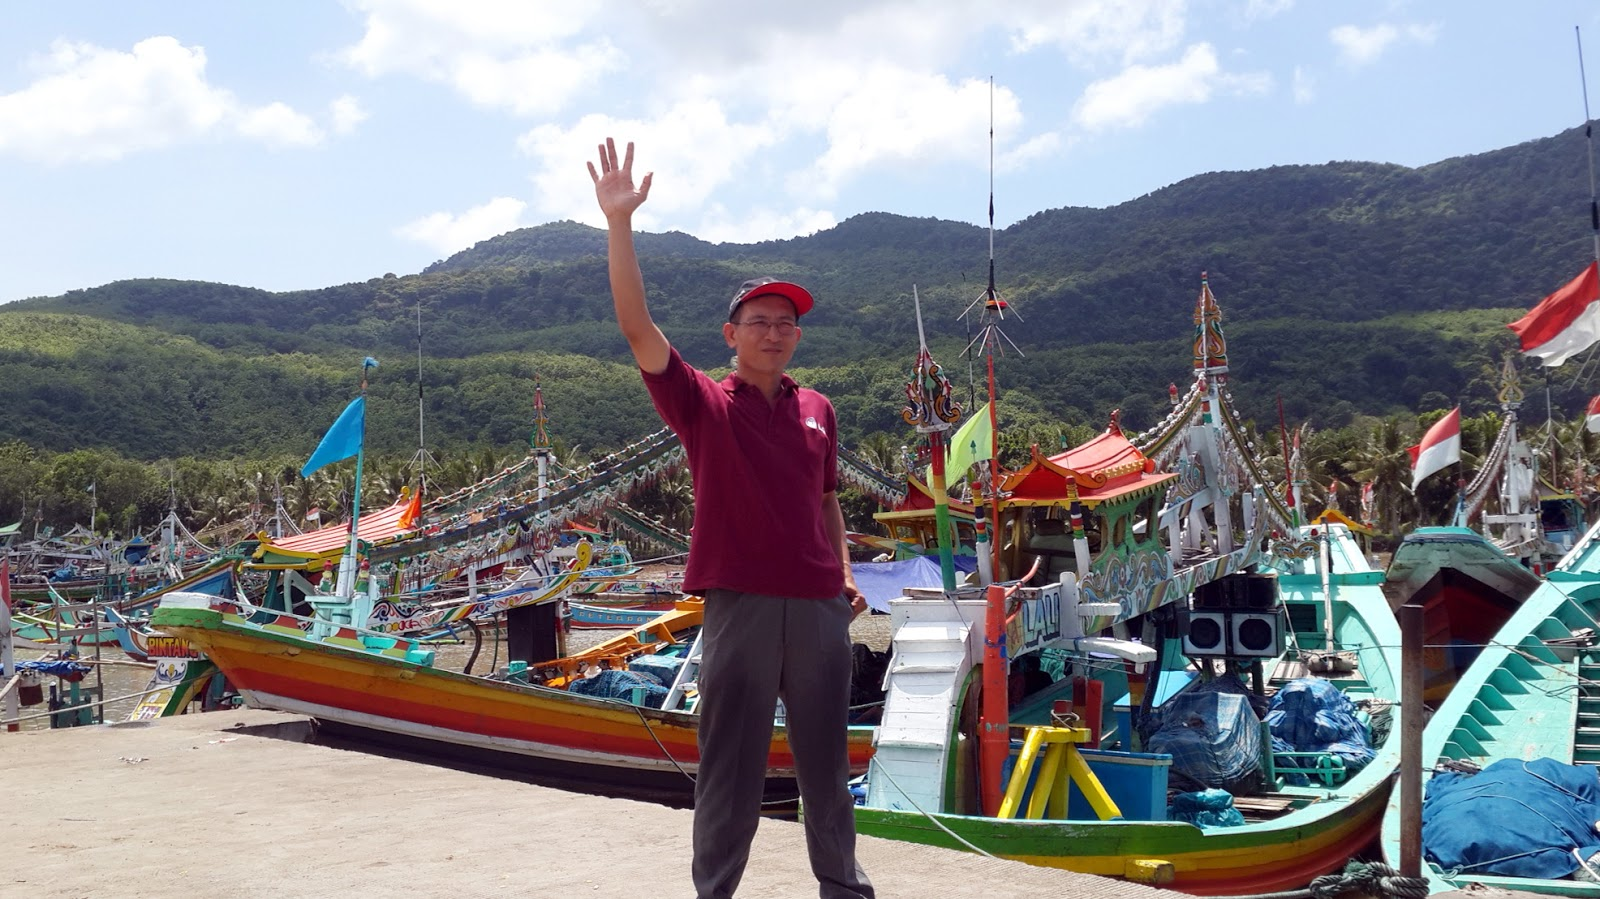 Firdaus Ubaidillah Pantai Nelayan Puger Kabupaten Jember Jawa Timur Bagi